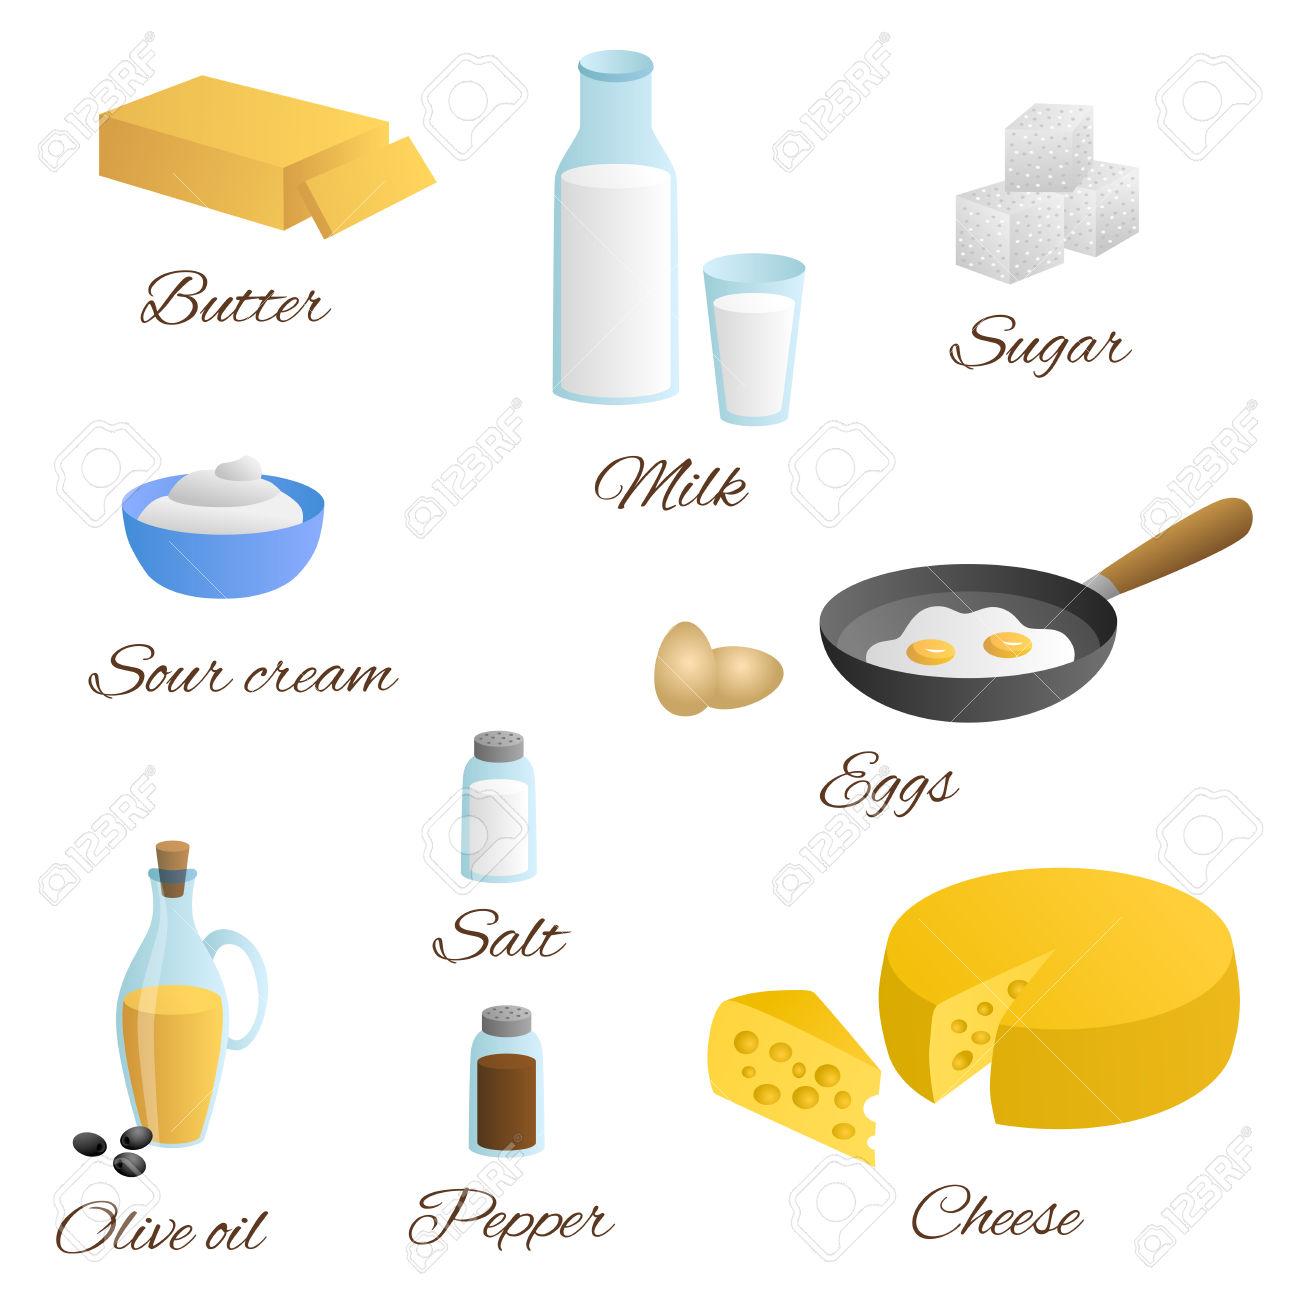 Food Milk Egg Butter Cheese Olive Oil Sour Cream Salt Pepper.